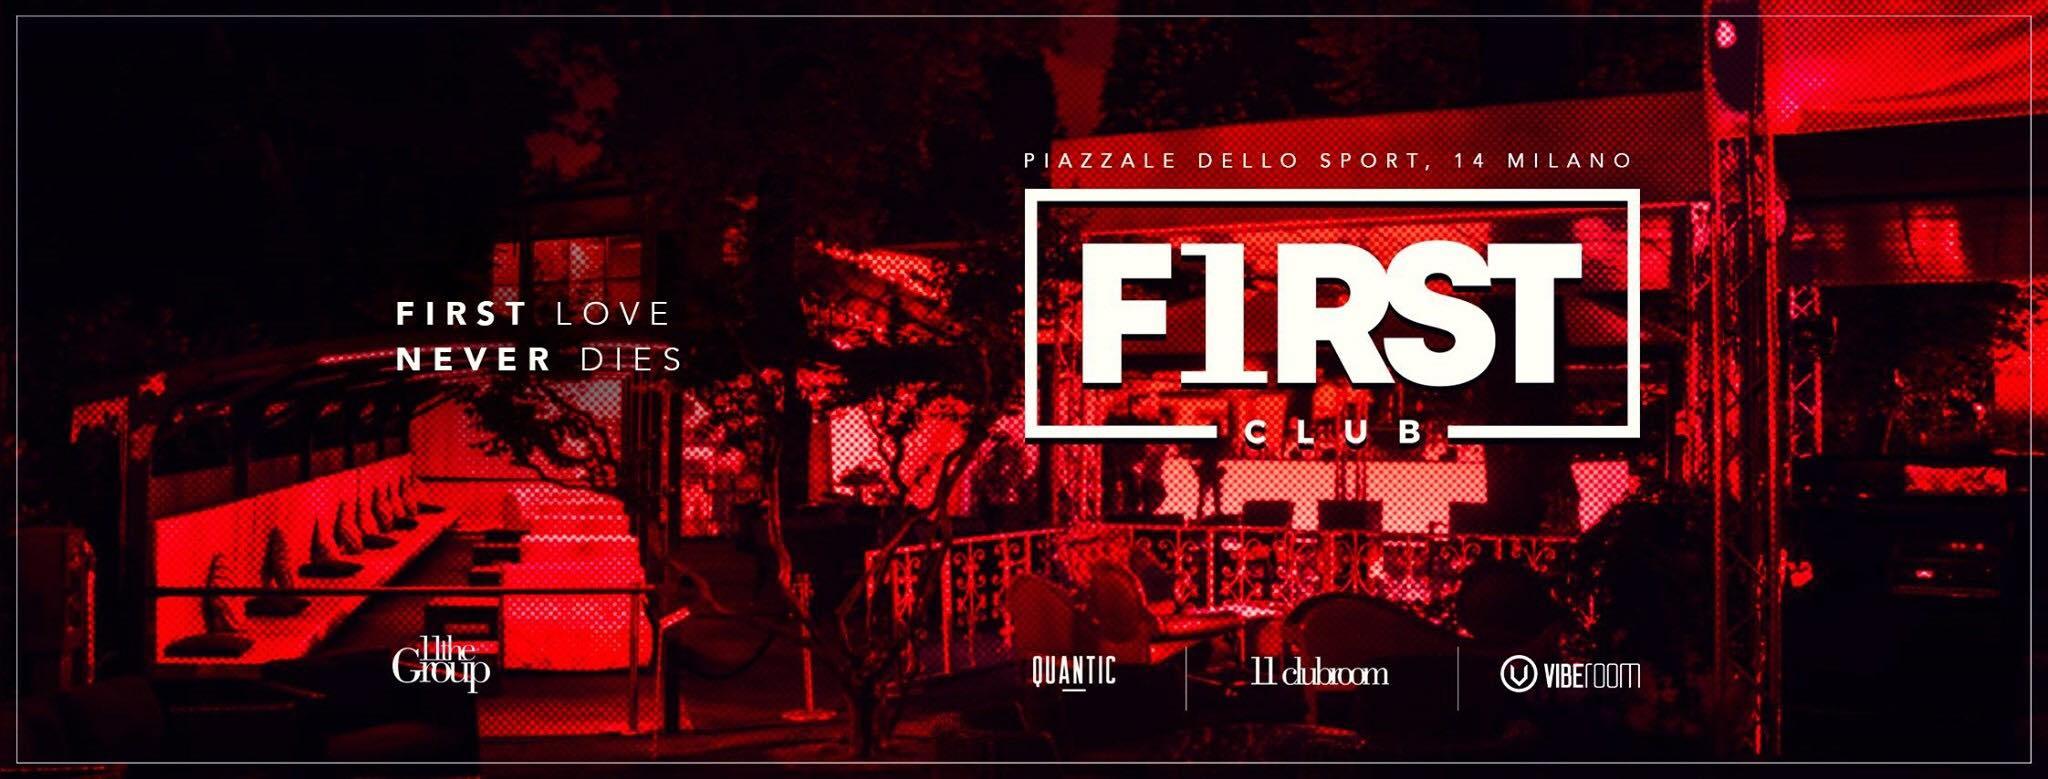 First club Milano venerdì 10 Agosto 2018